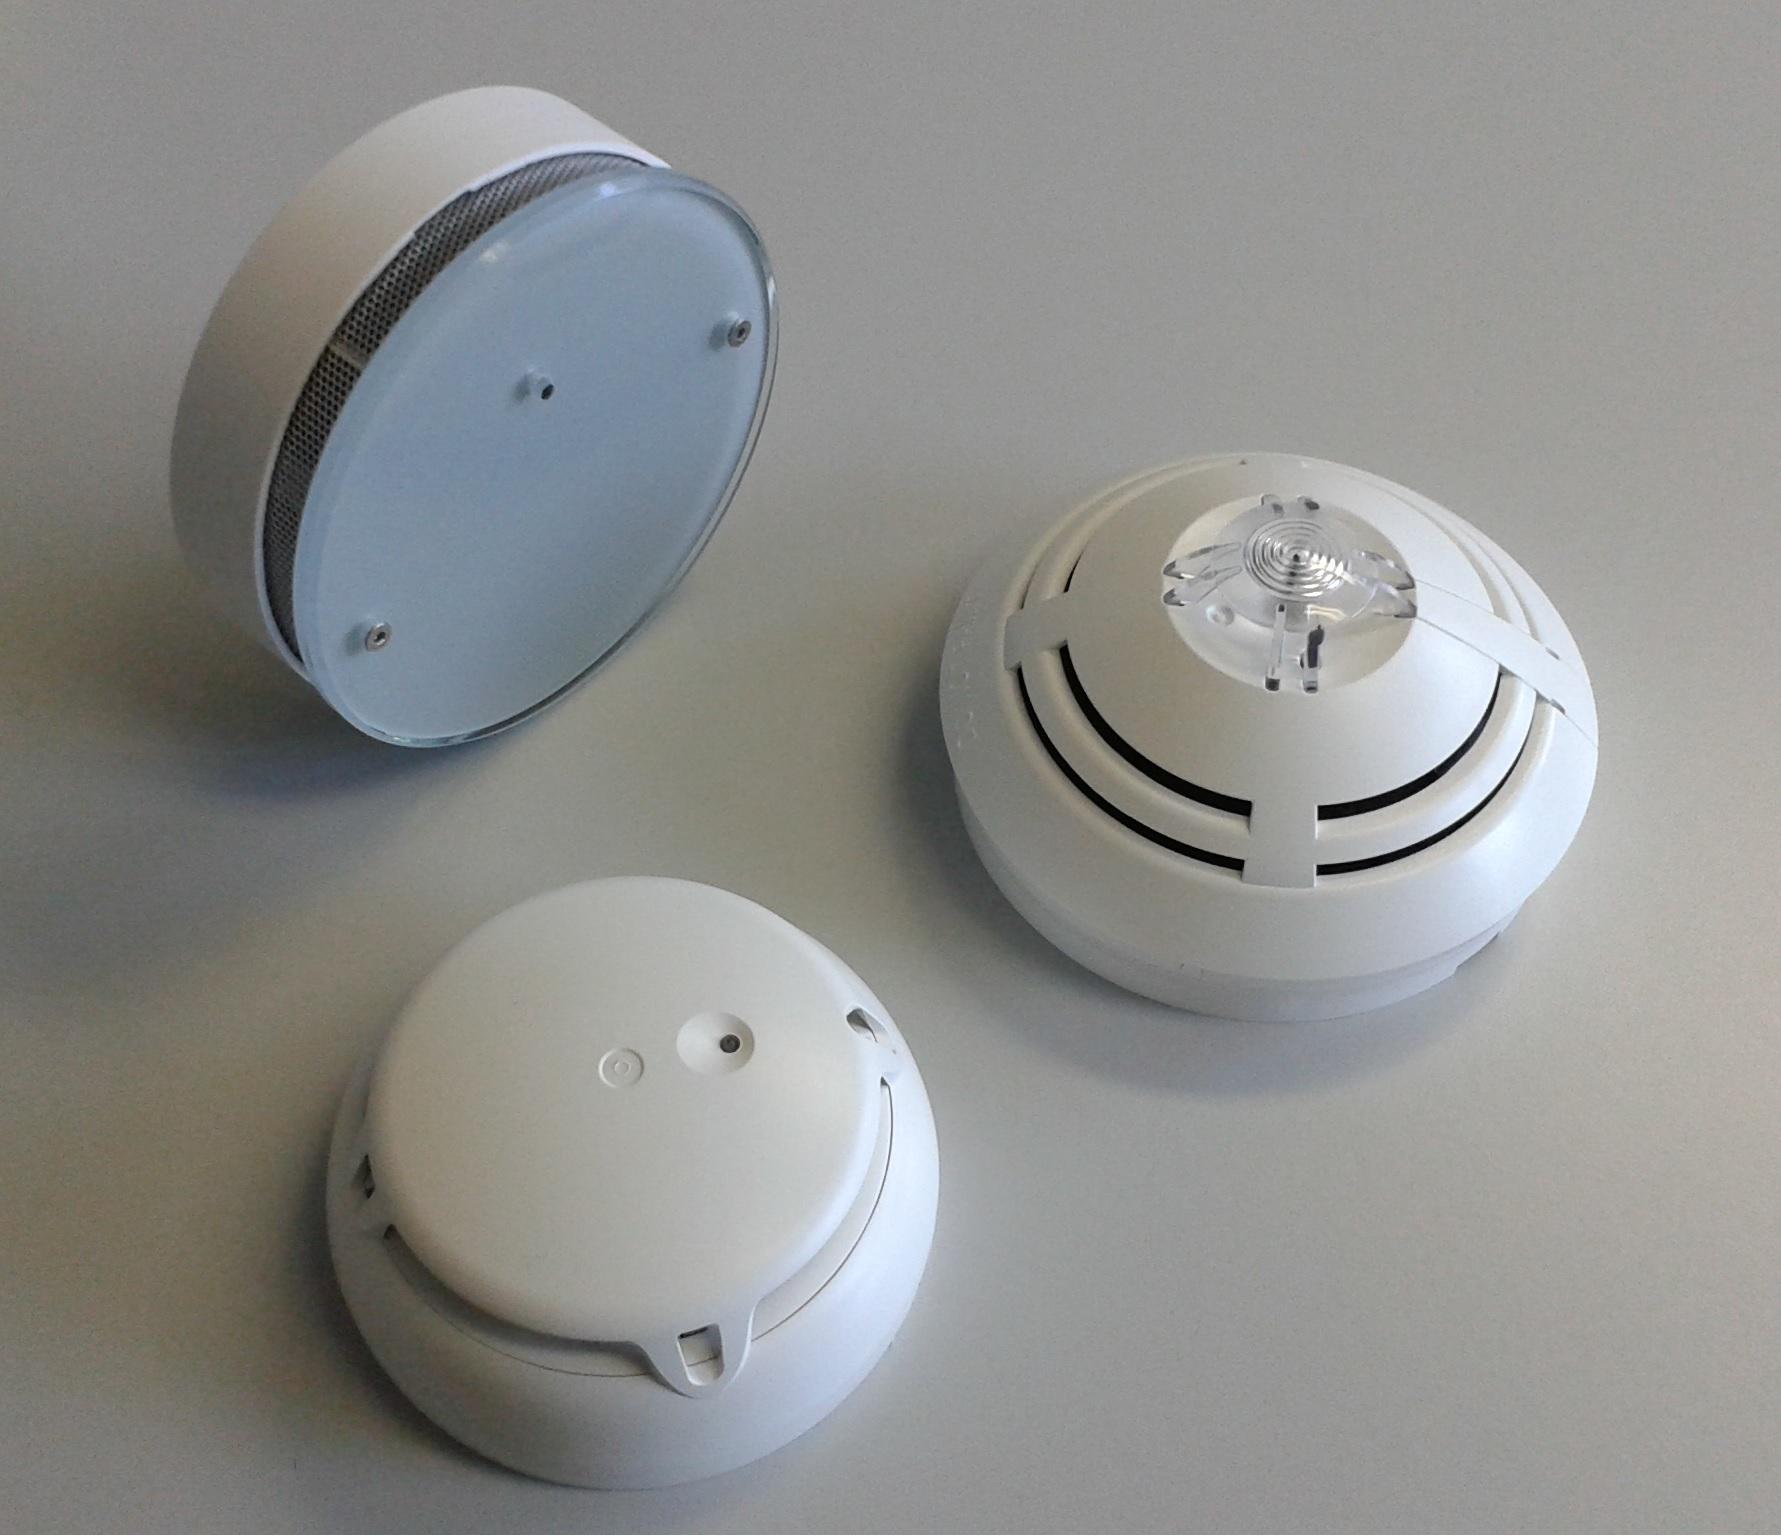 rauchmelder retten leben forth eletrotechnik gmbh. Black Bedroom Furniture Sets. Home Design Ideas